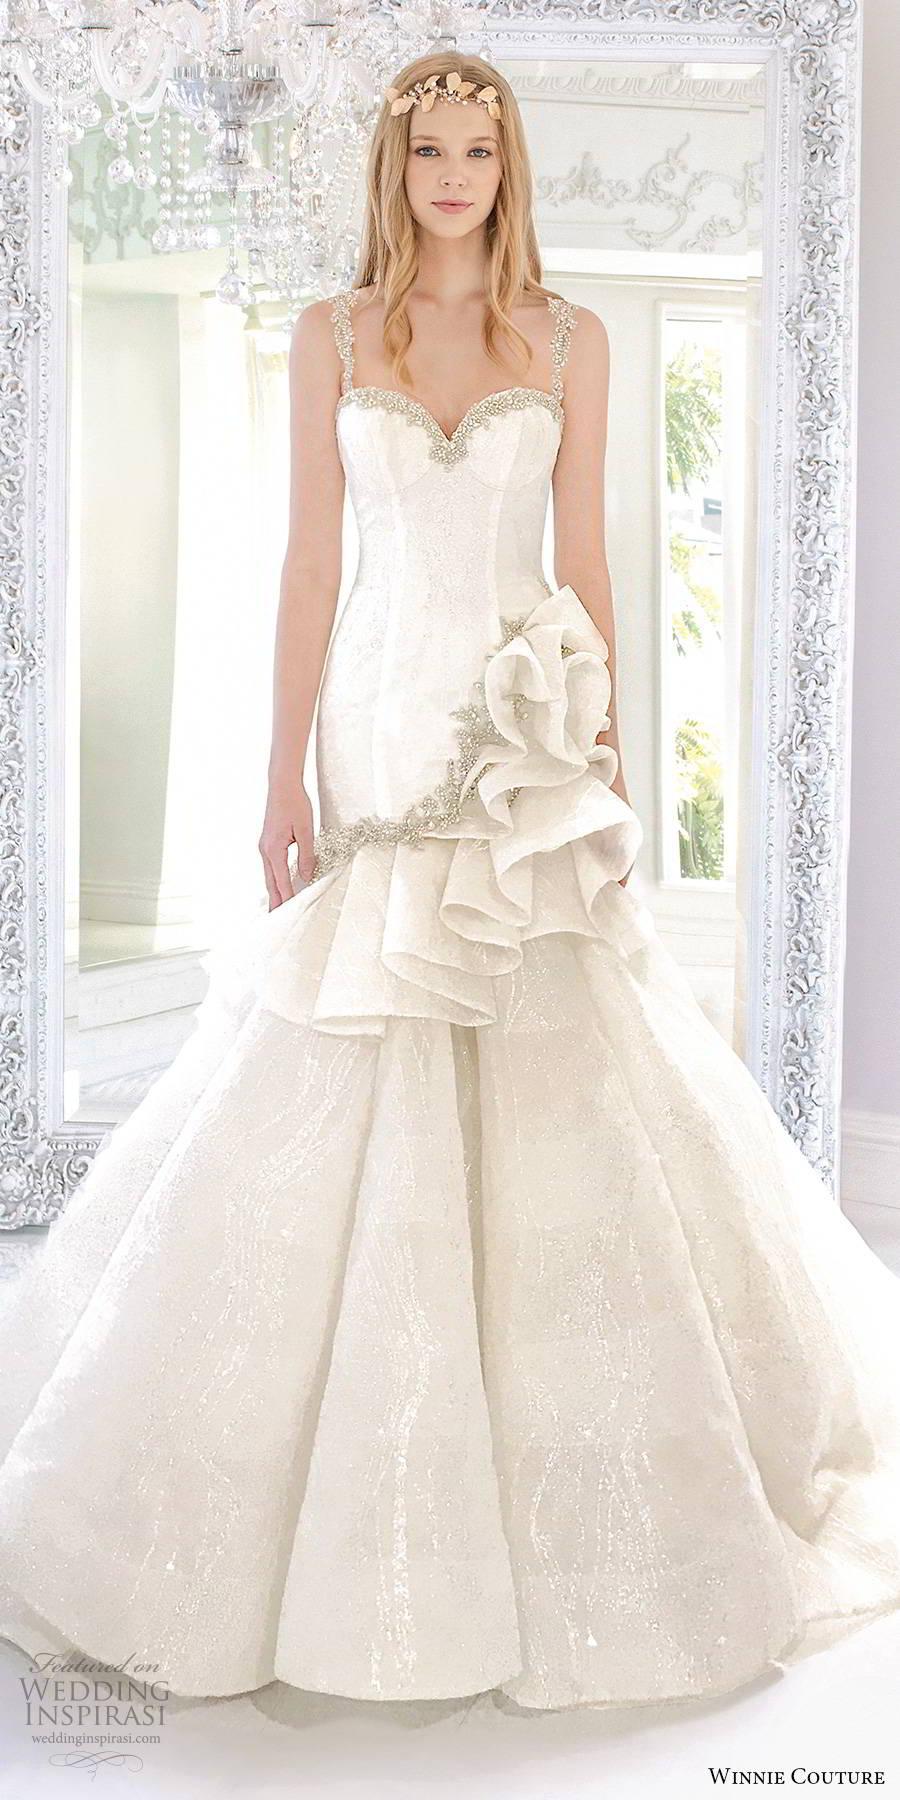 winnie couture 2019 bridal sleeveless beaded straps embellished sweetheart neckline elegant fit flare mermaid wedding dress (16) mv